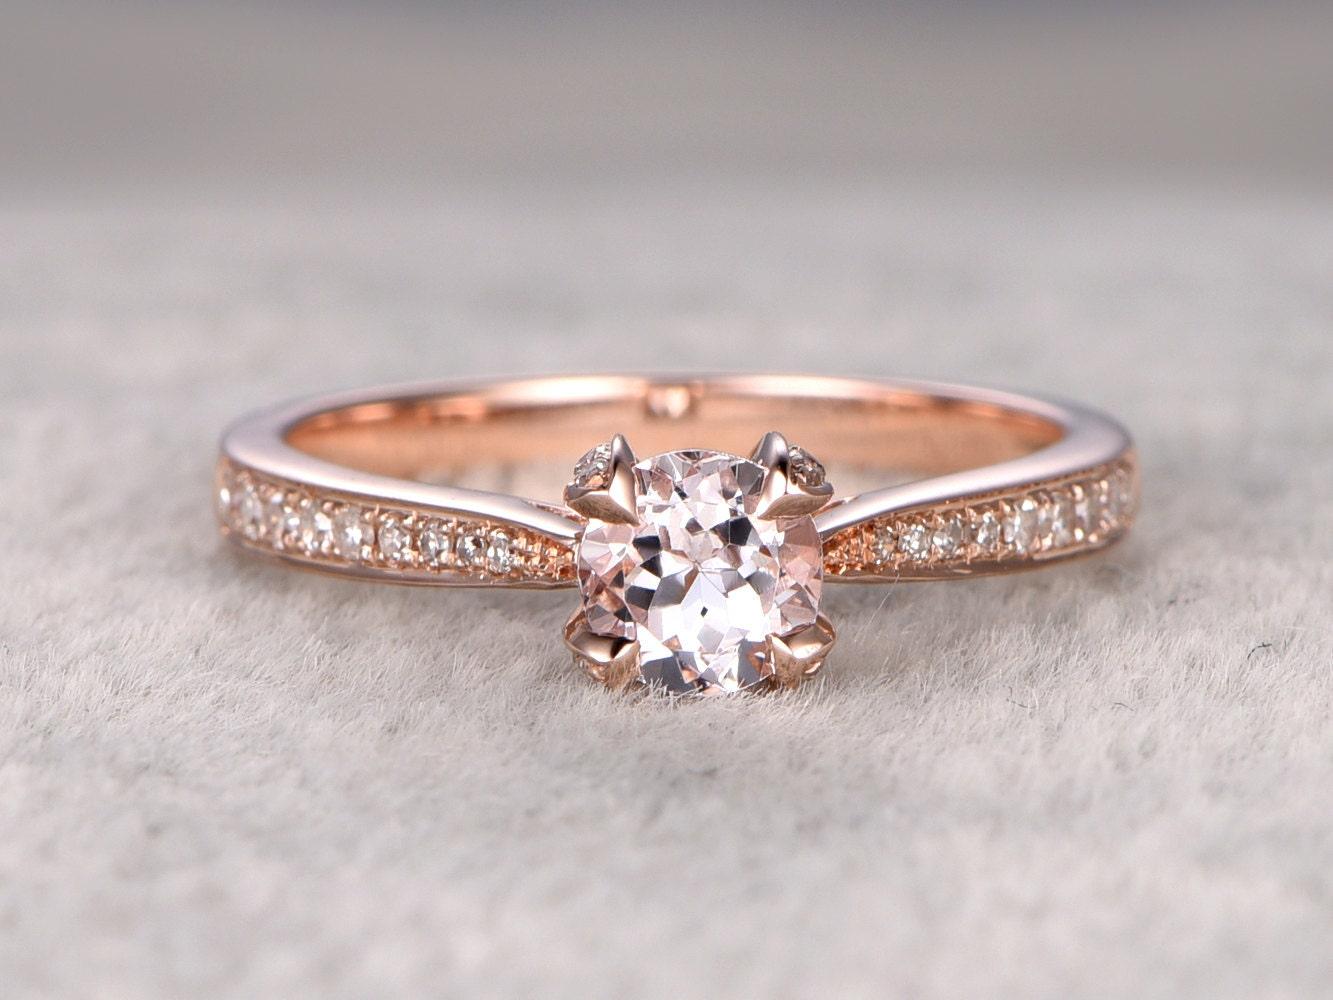 morganite engagement ring rose golddiamond wedding by popring. Black Bedroom Furniture Sets. Home Design Ideas